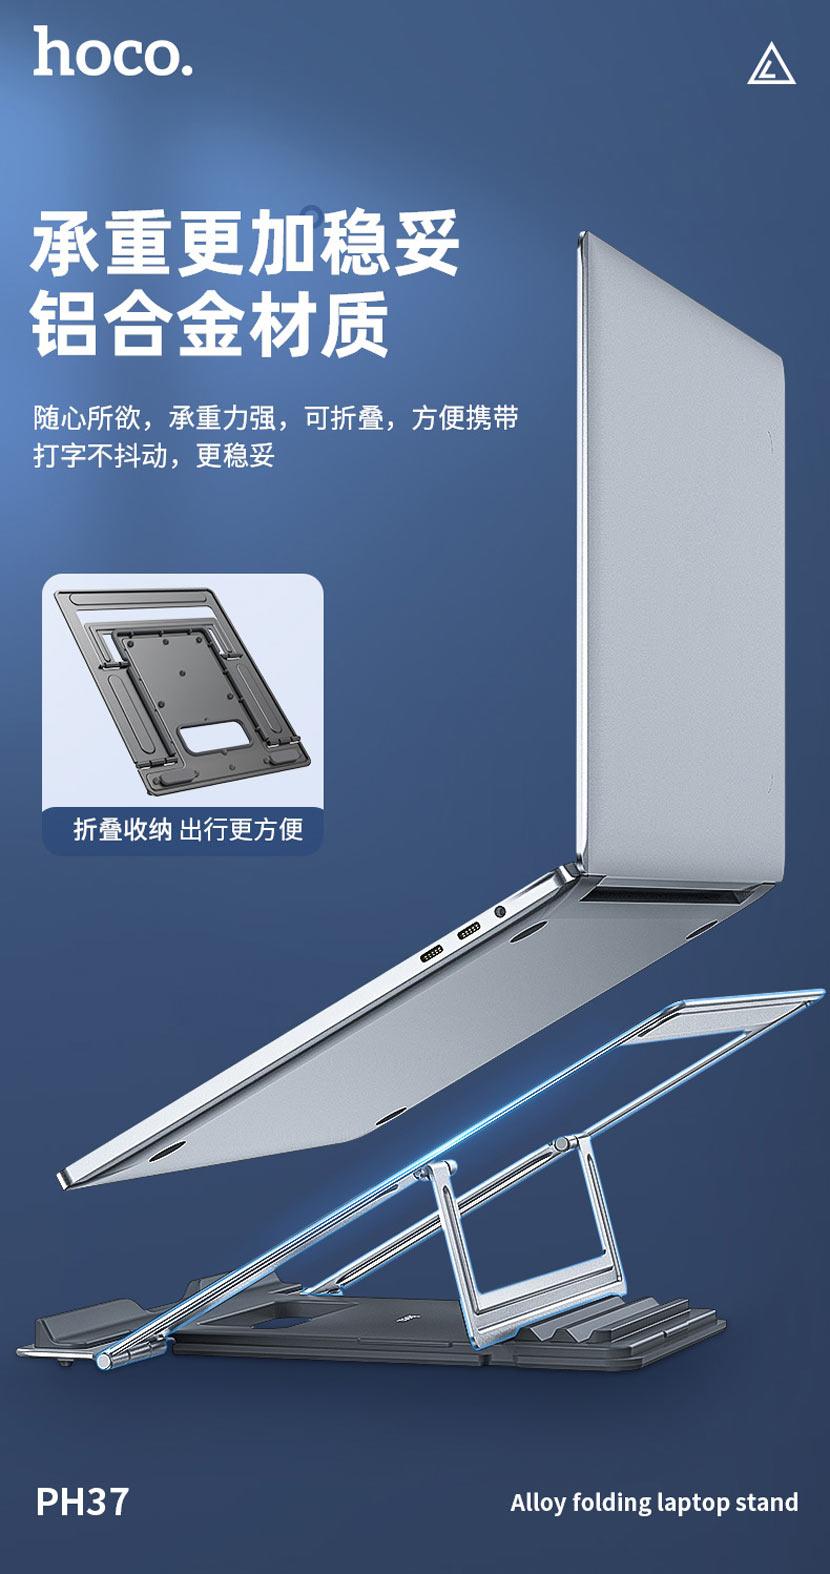 hoco news ph37 excellent aluminum alloy folding laptop stand secure cn